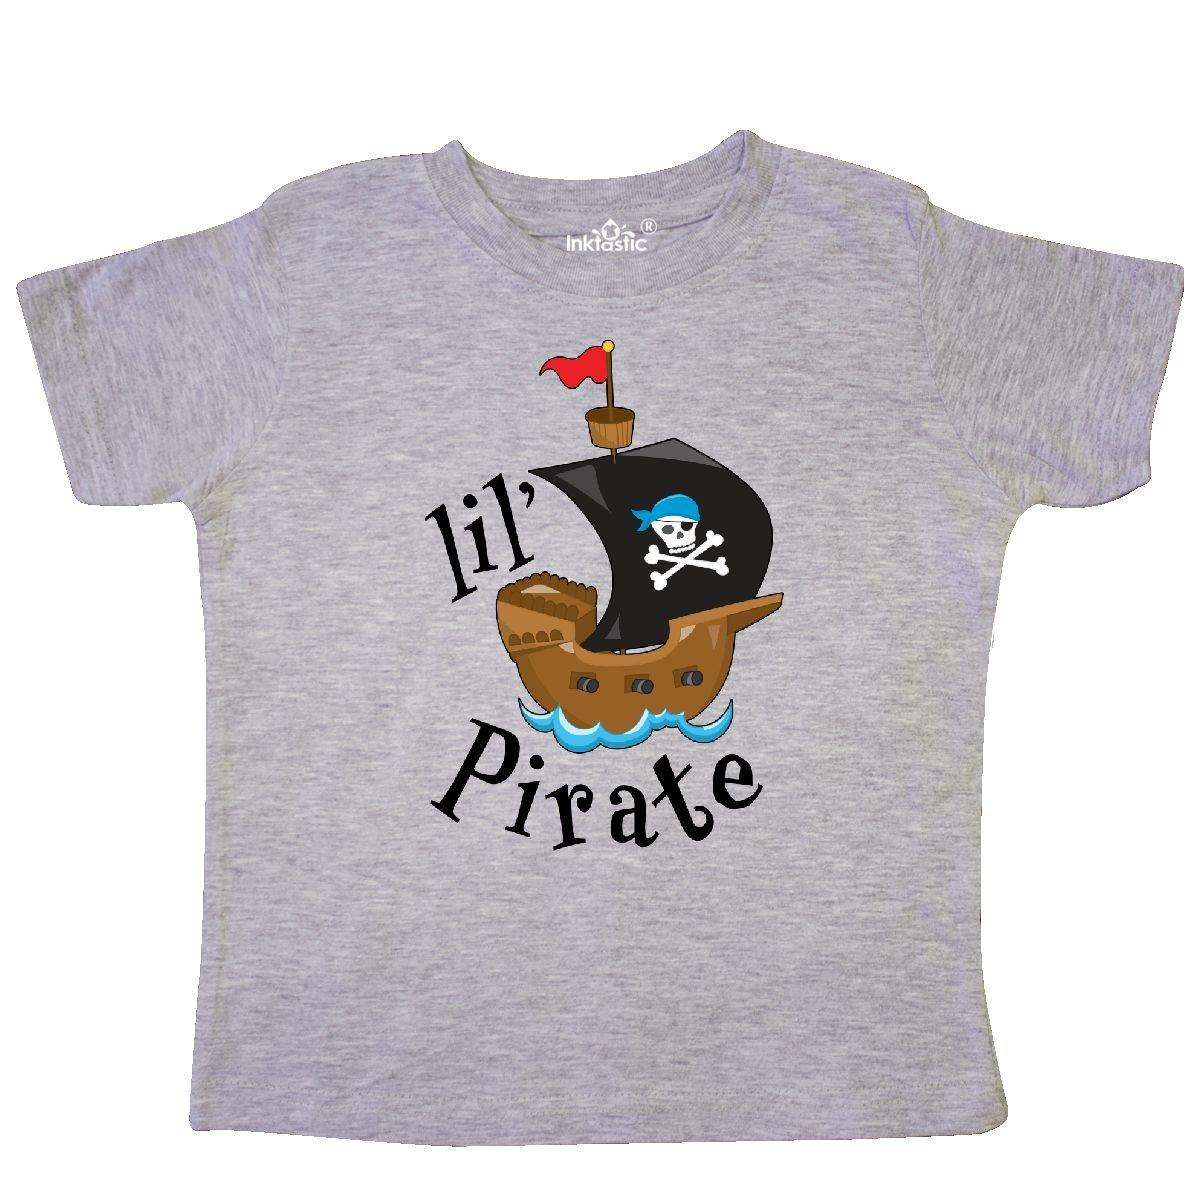 Lil Pirate Pirate Ship Blue Bandana Tshirt 2d7